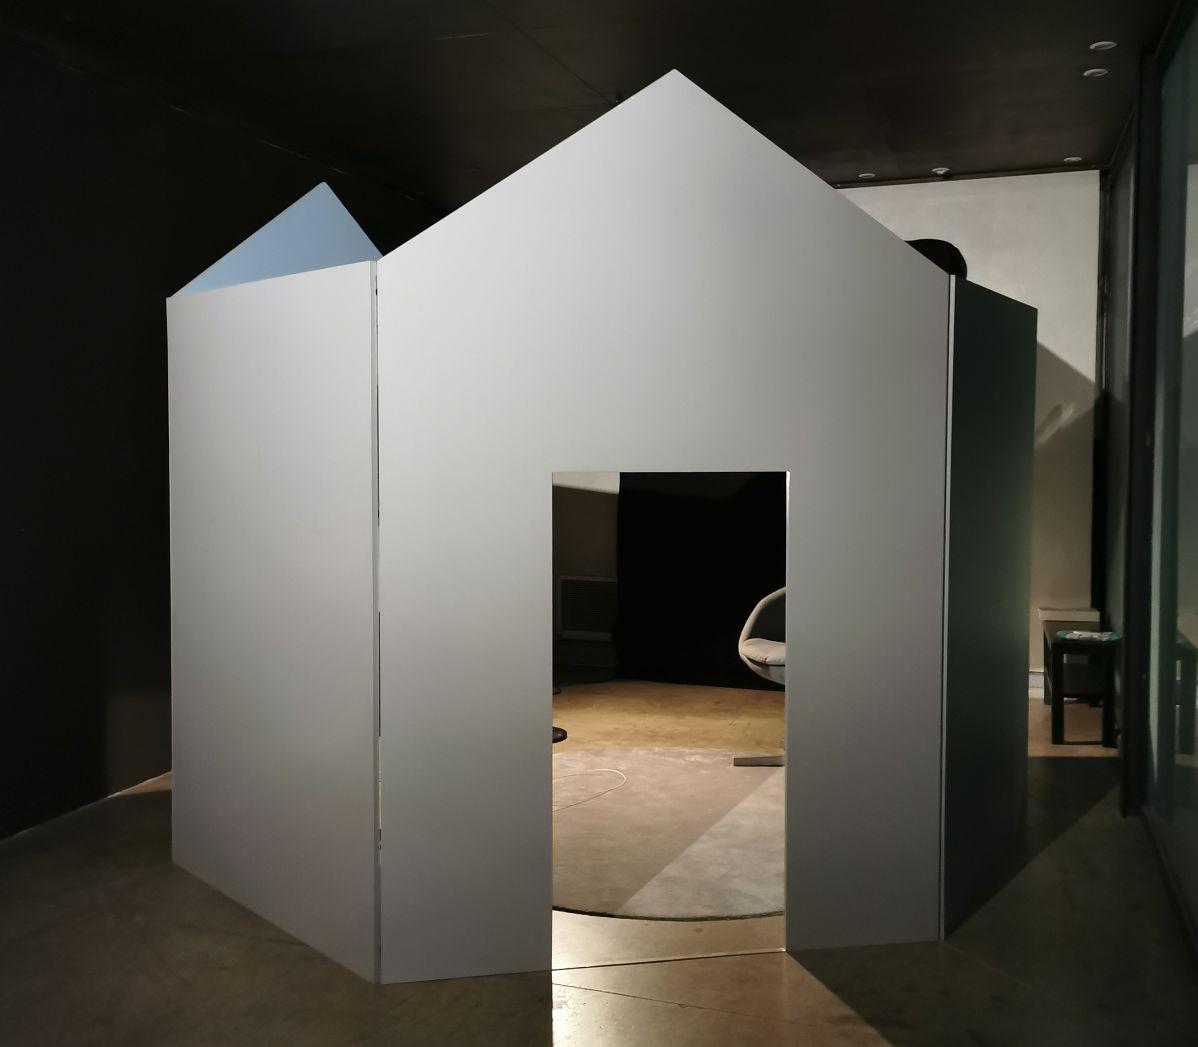 Jeanne Susplugas - I Will Sleep When I'm Dead, 2020 - J'ai fait ta maison dans ma boite crânienne à l'Ardenome – Avignon